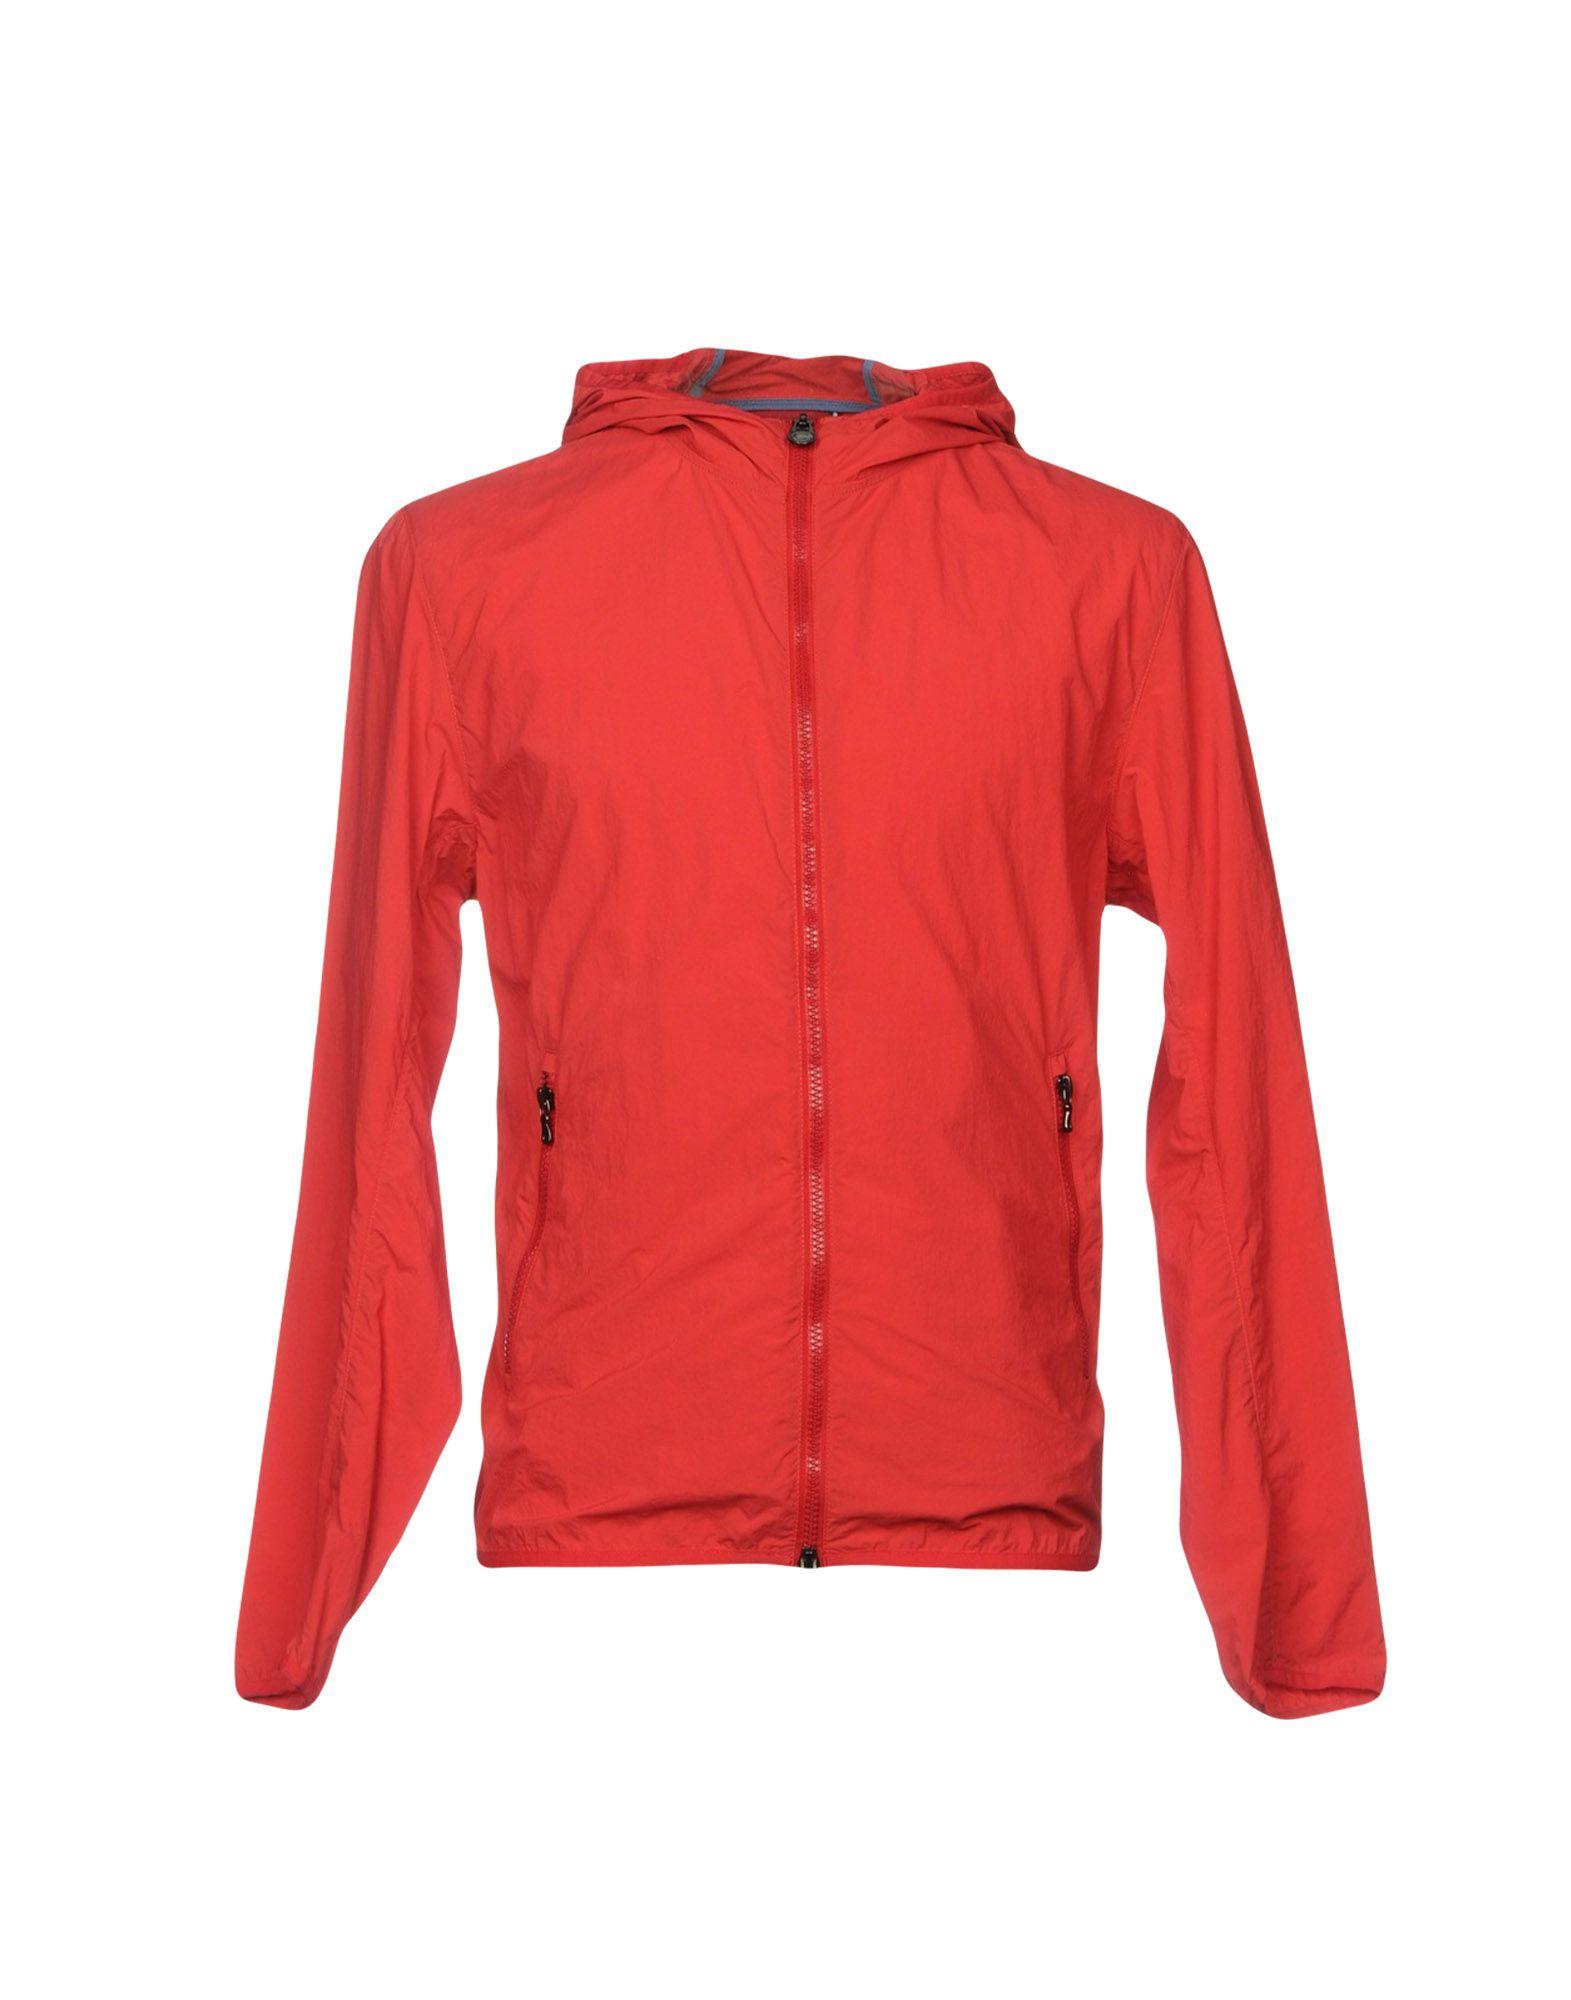 COLMAR ORIGINALS Jacket in Red